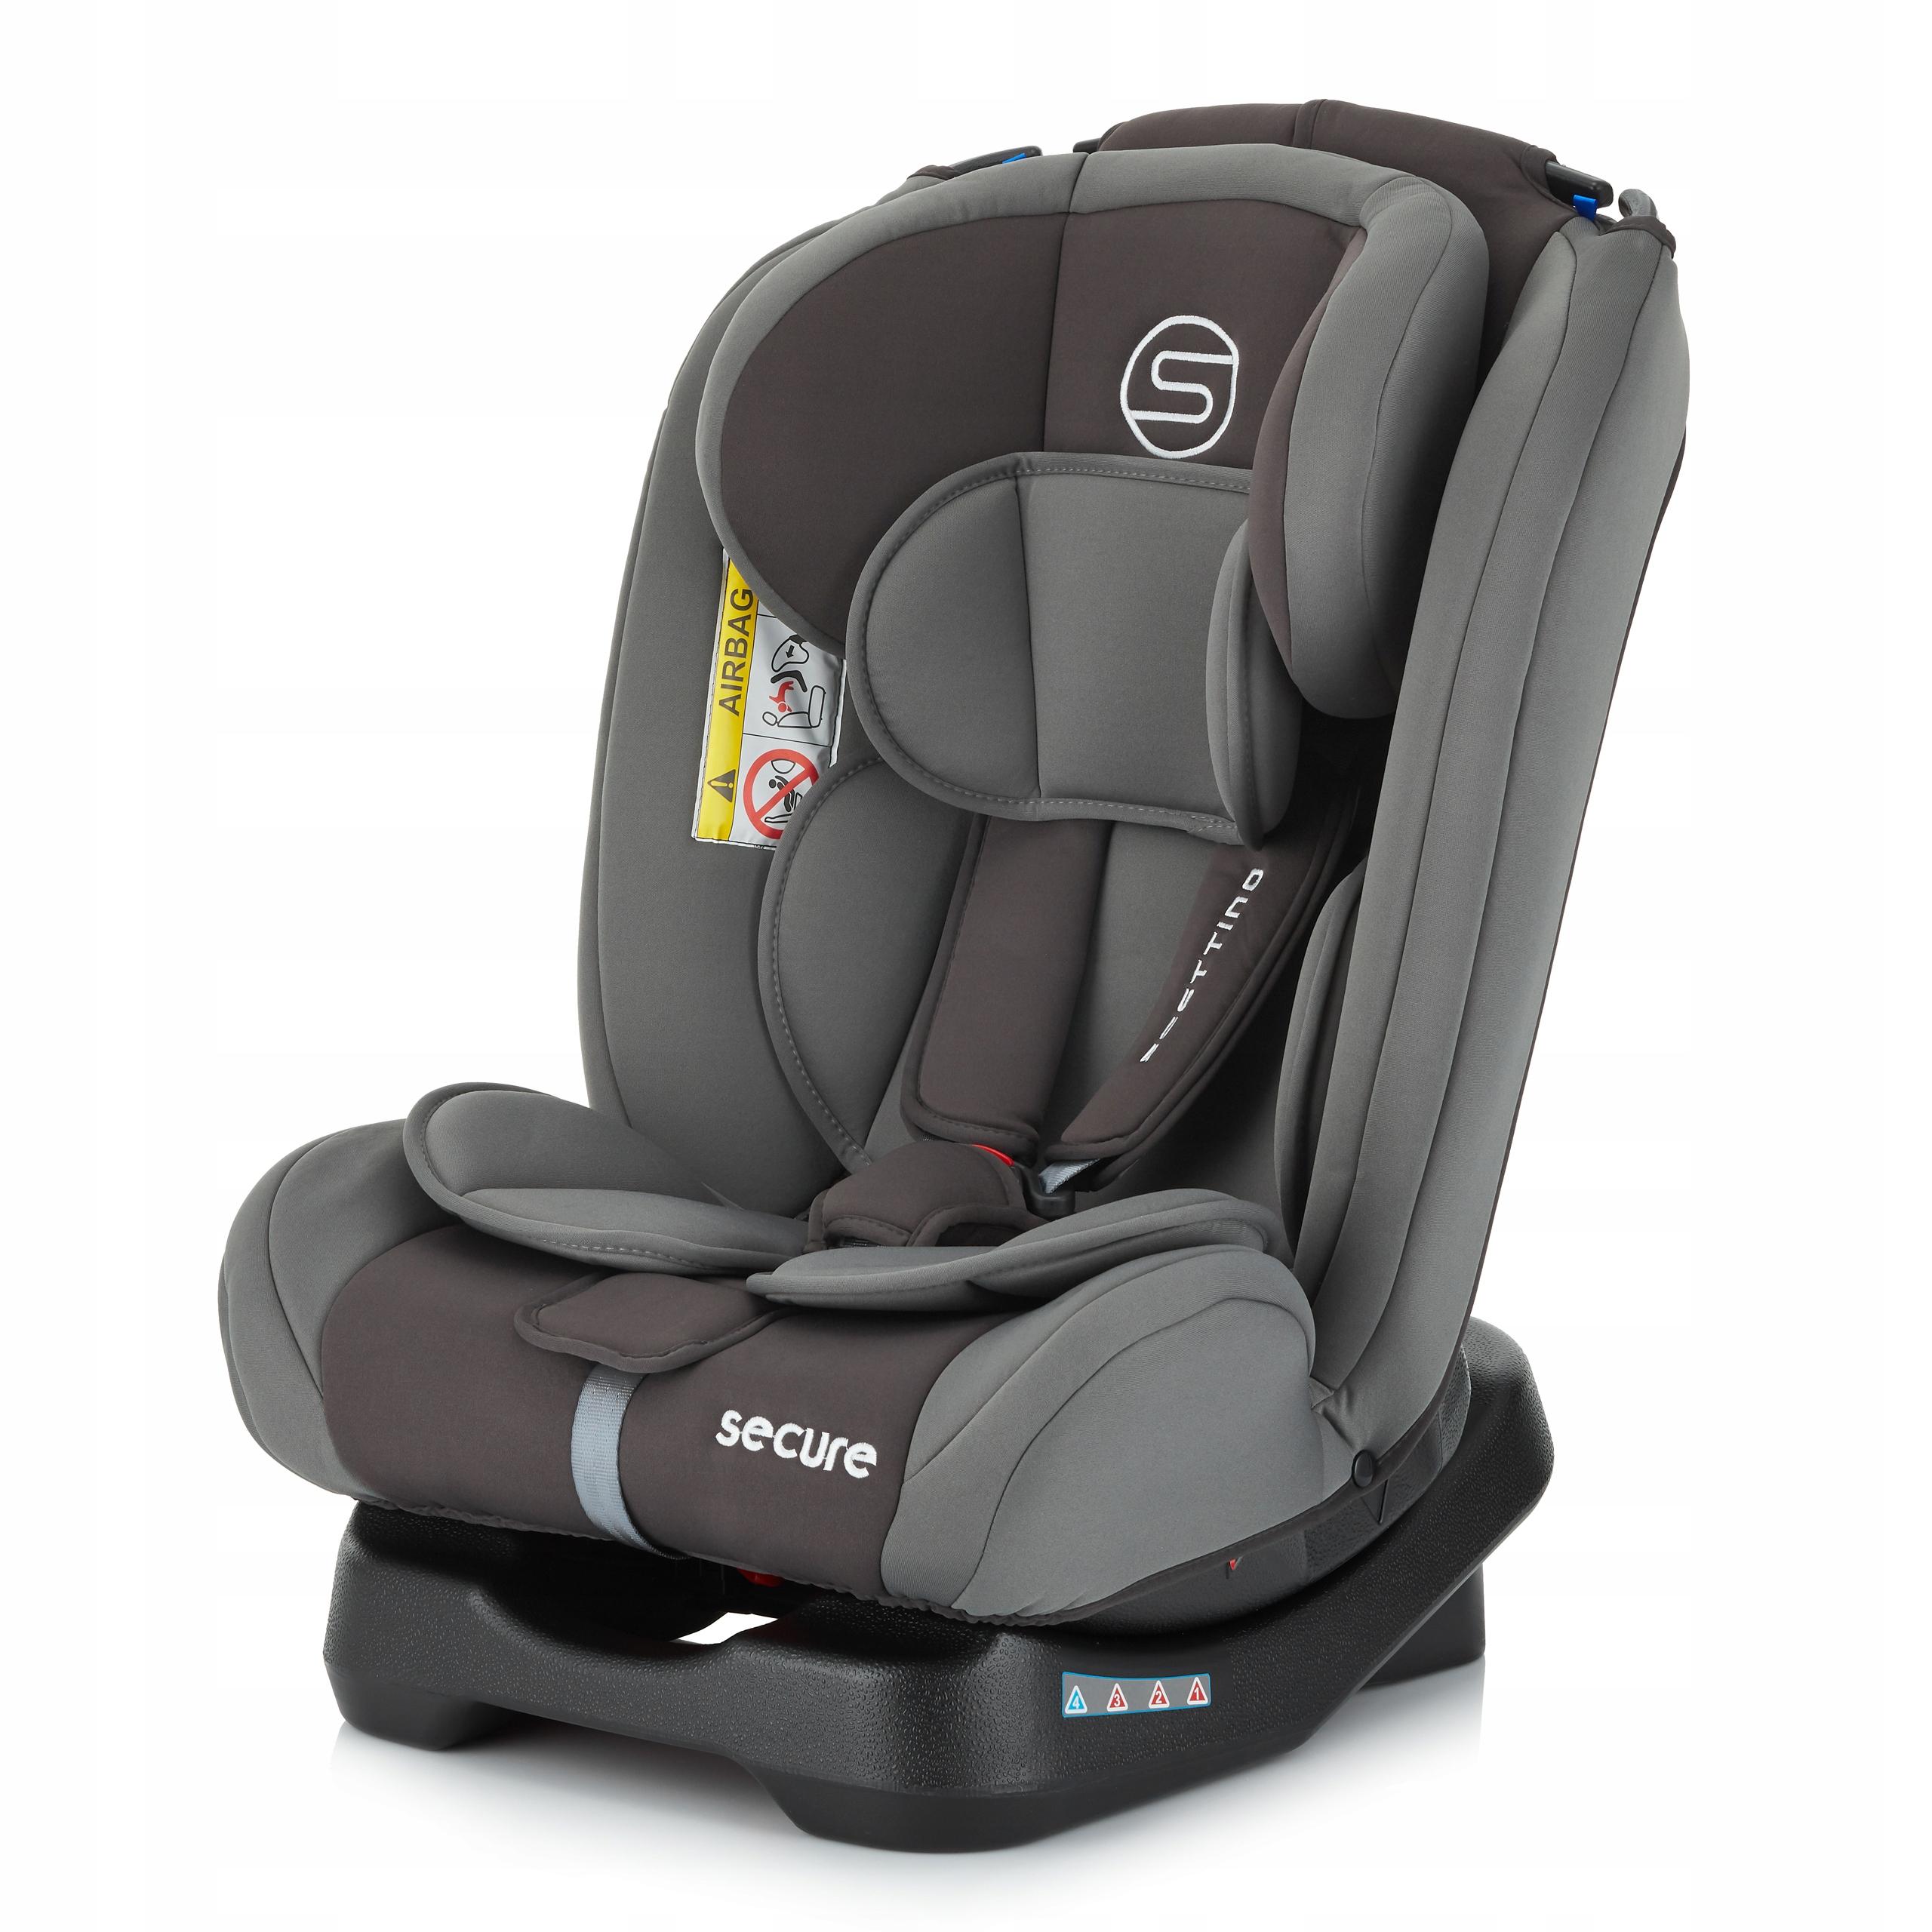 Fotelik samochodowy Sesttino Secure PRO 0-36kg Marka Sesttino